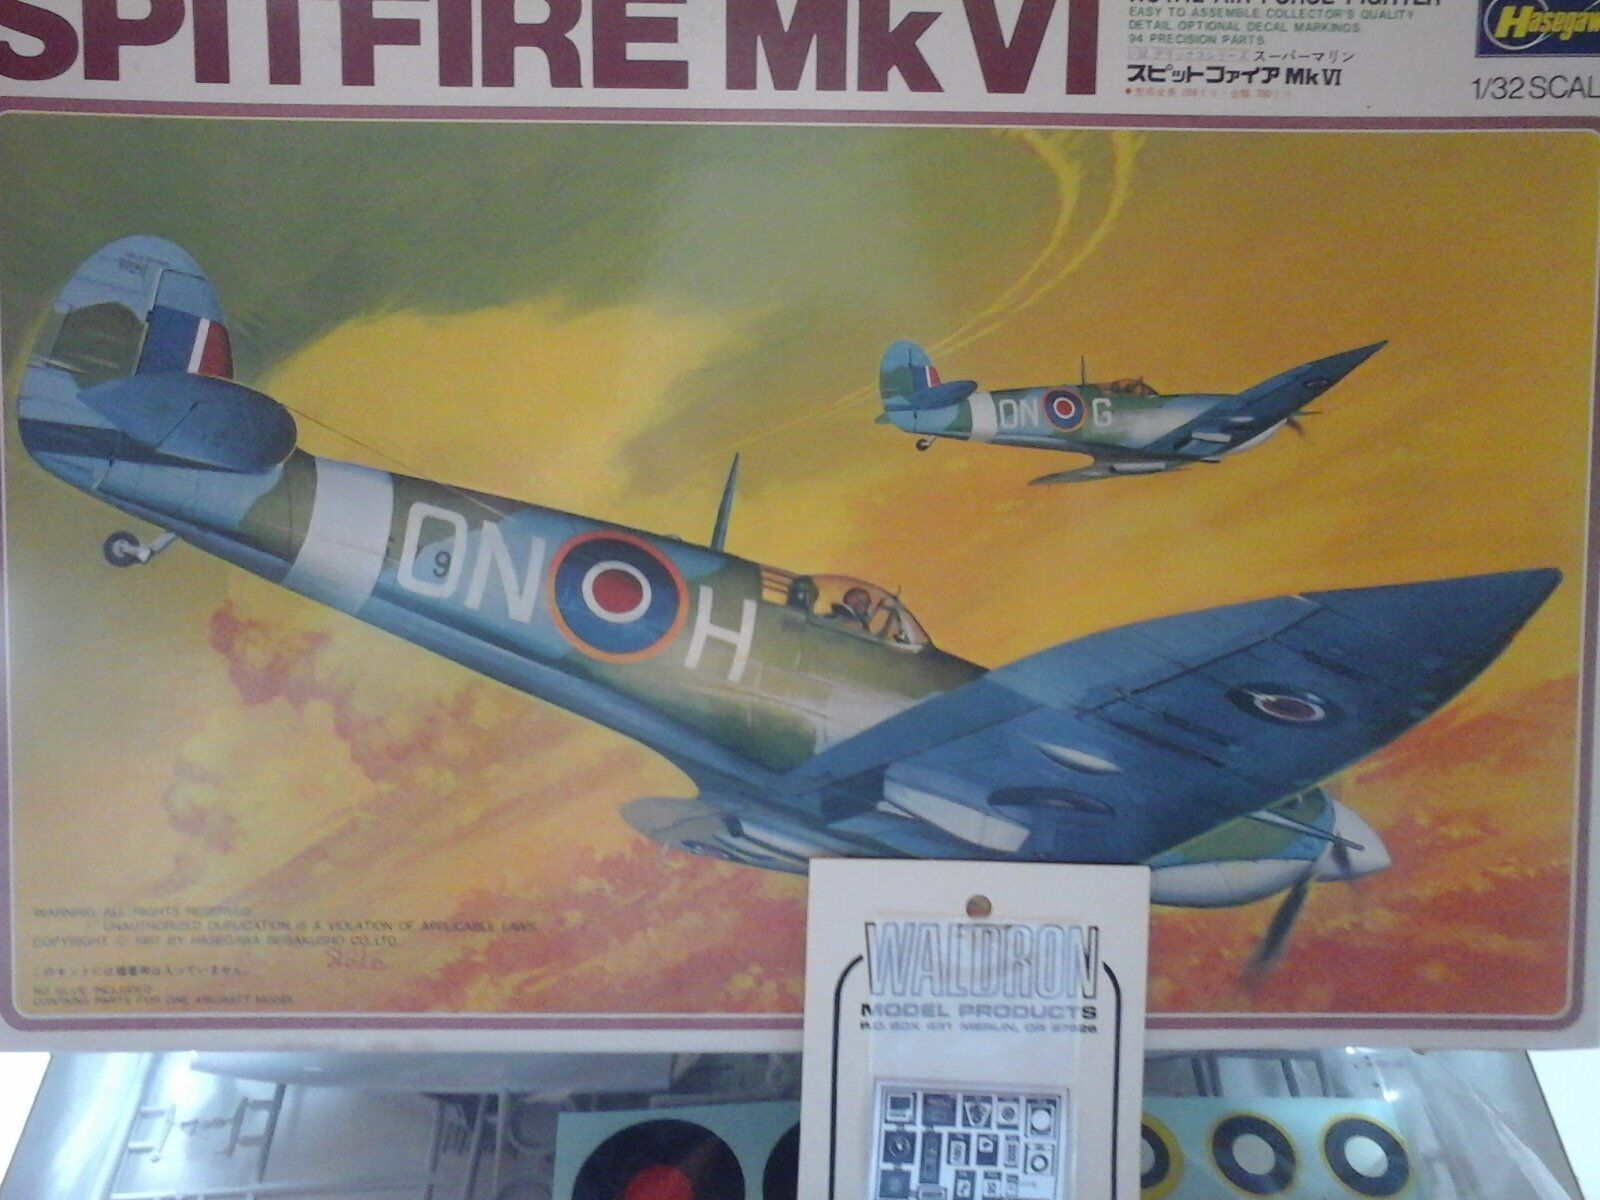 SPITFIRE Mk VI 1 32 SCALE HASEGAWA MODEL+ WALDRON MODEL DETAIL PARTS